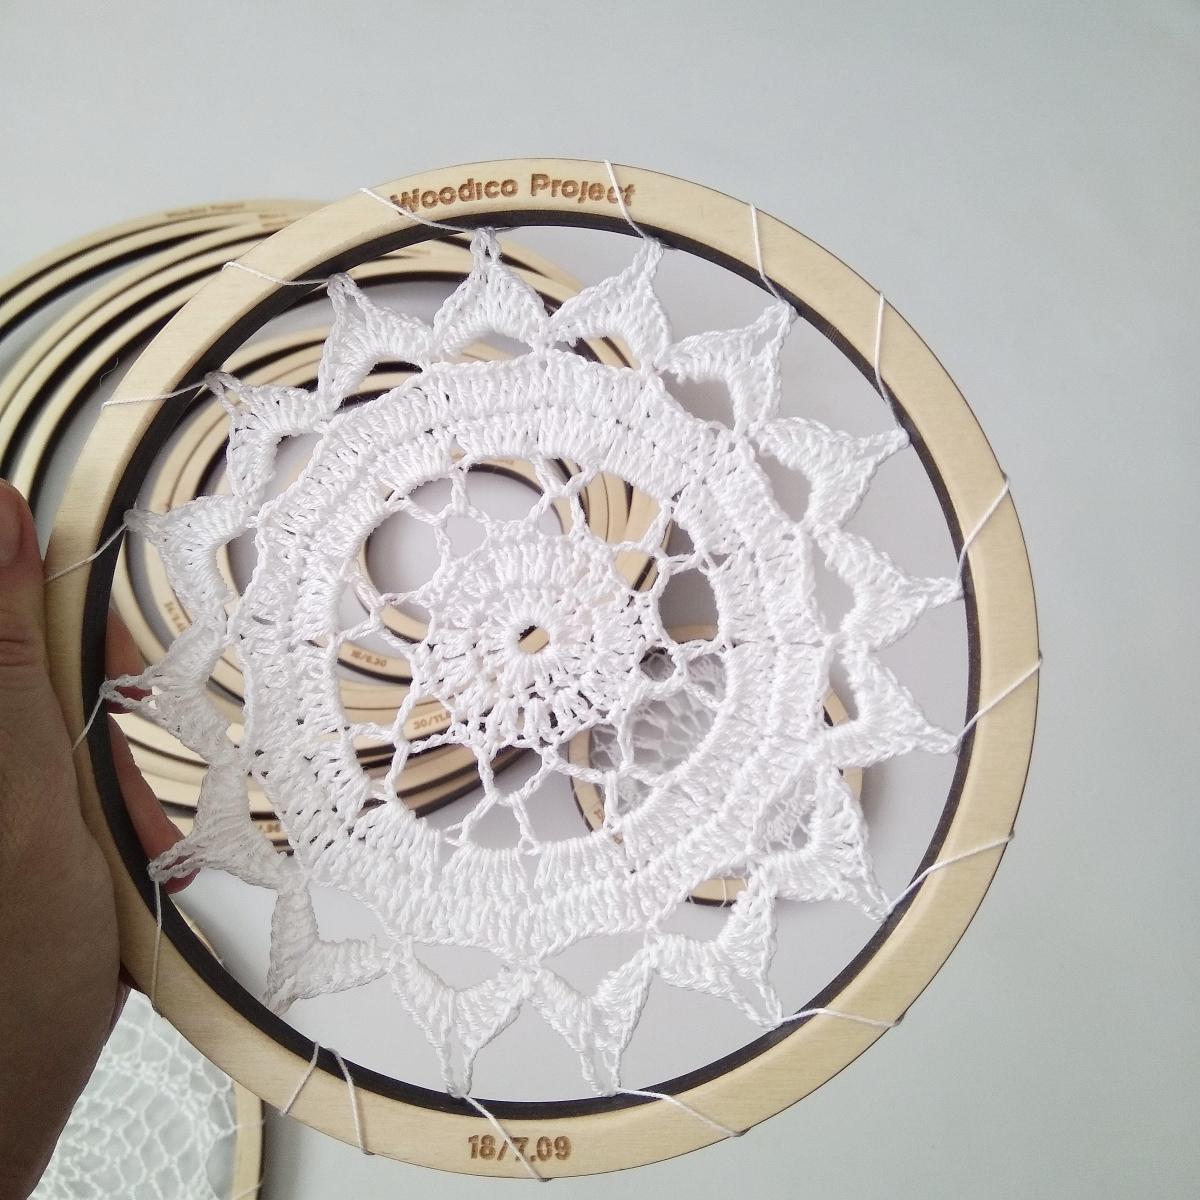 woodico.pro dream catcher base set of 15 rings 12 40 cm 8 1200x1200 - Dream catcher base / Set of 15 rings 12-40 cm